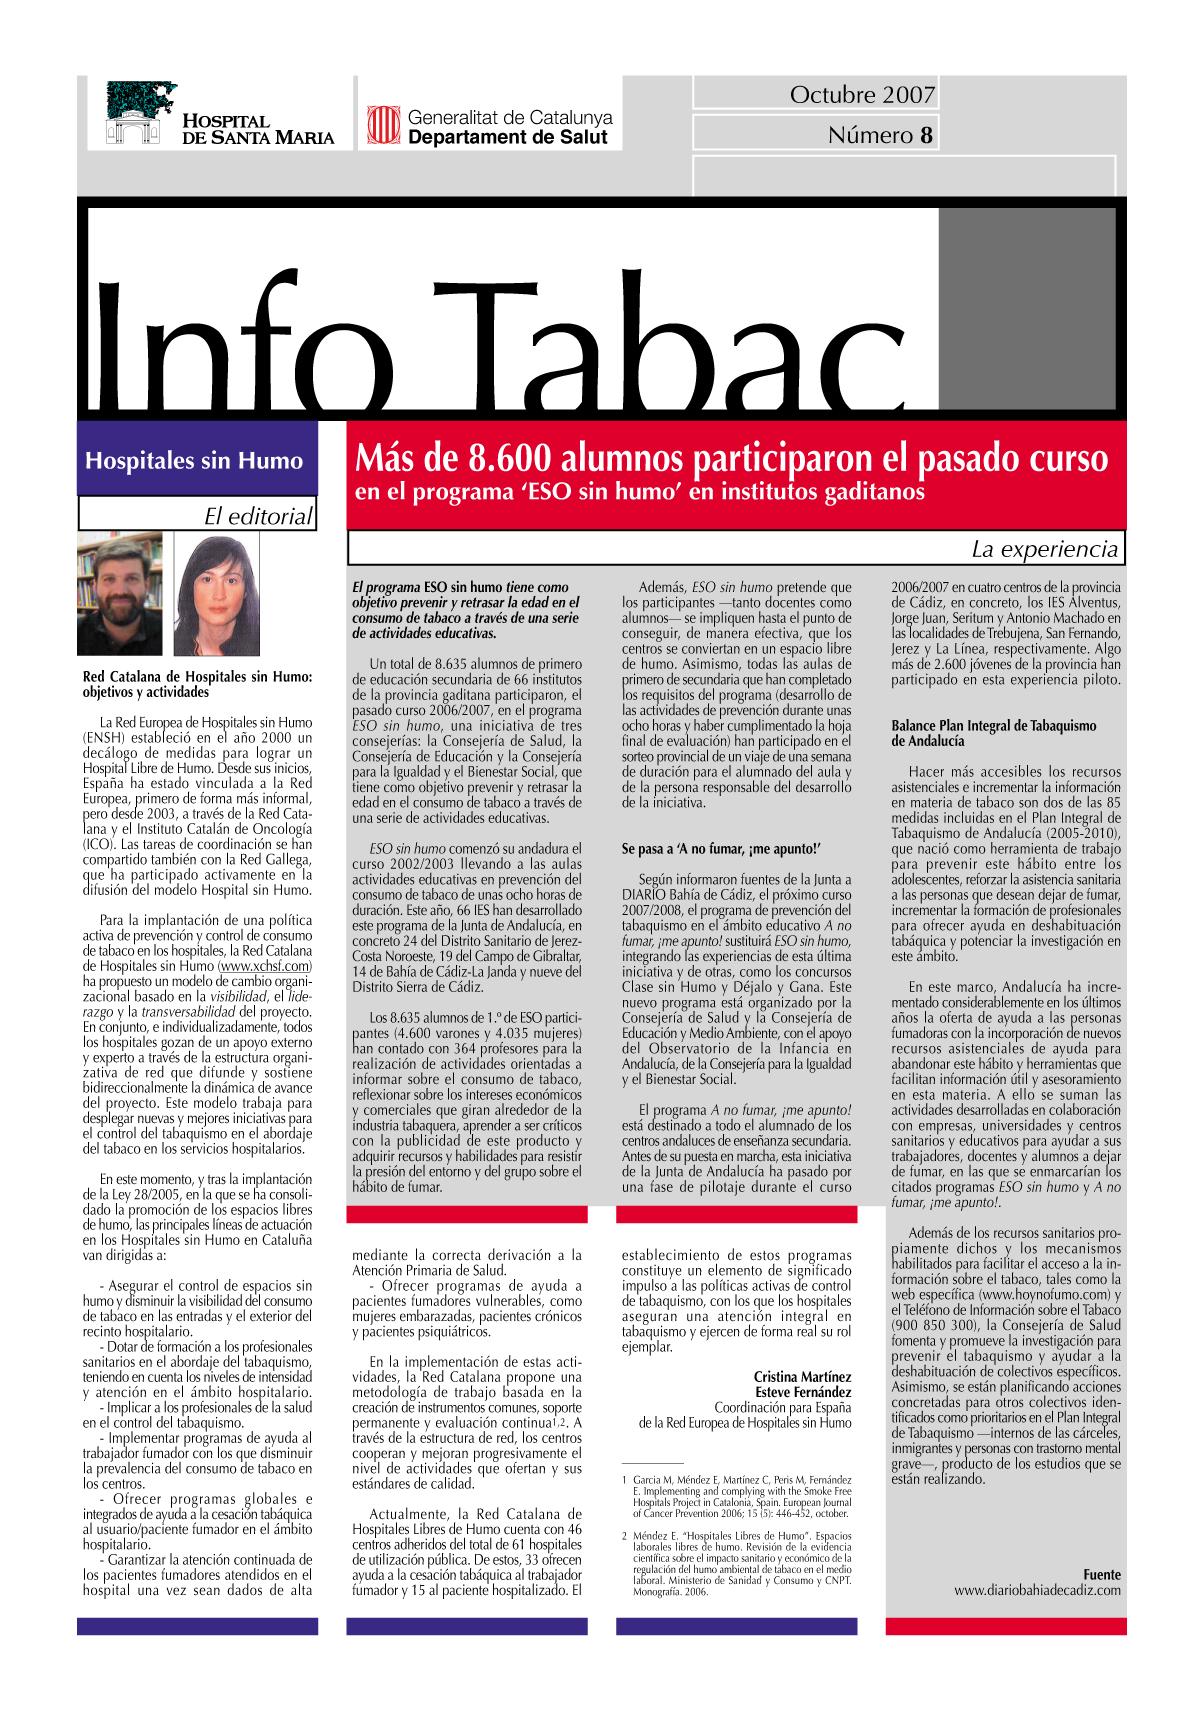 Info Tabac nº8 - Octubre 2007